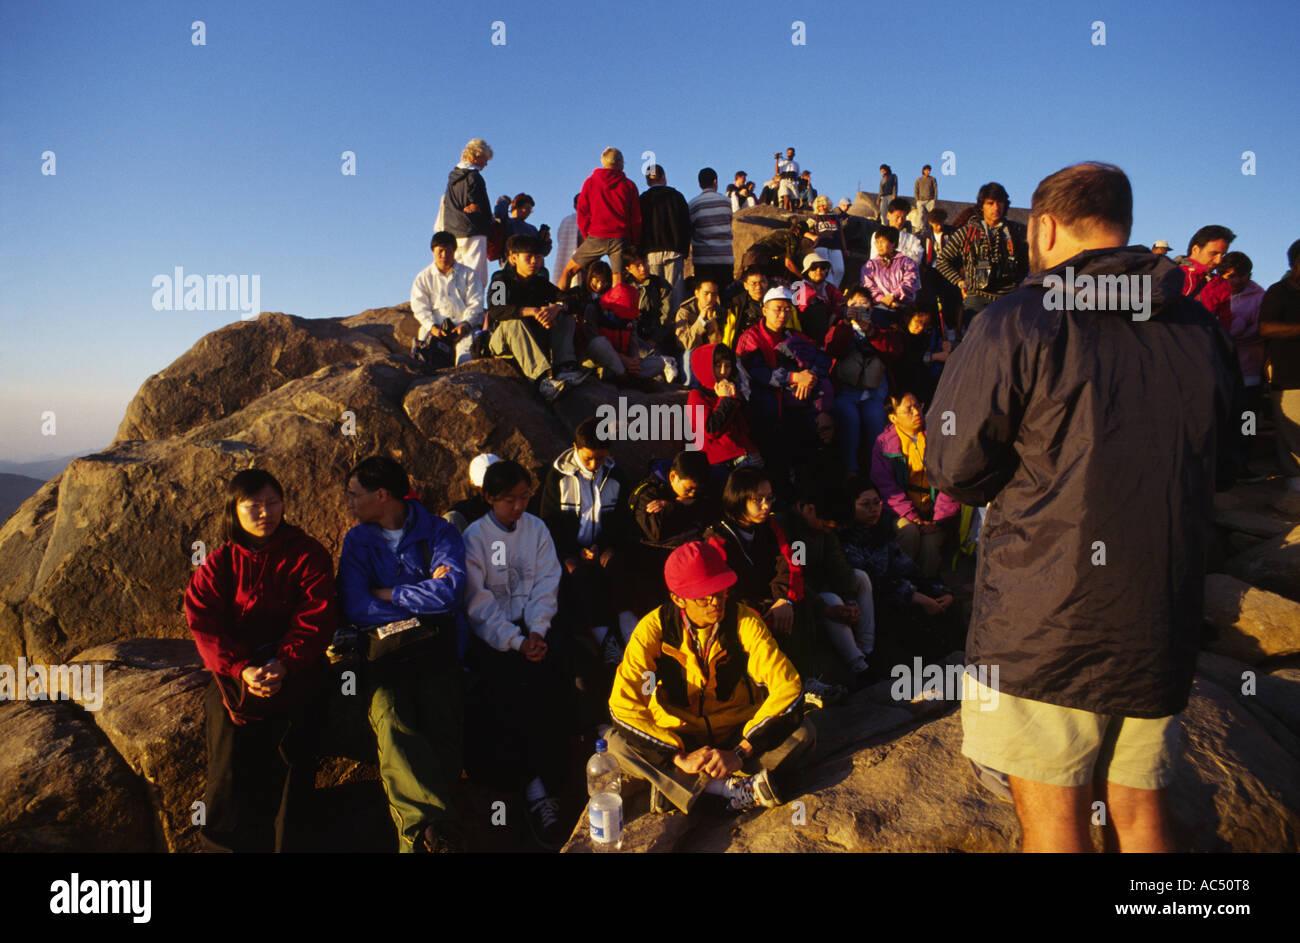 Pilgrims on the top of Mt Sinai Egypt - Stock Image